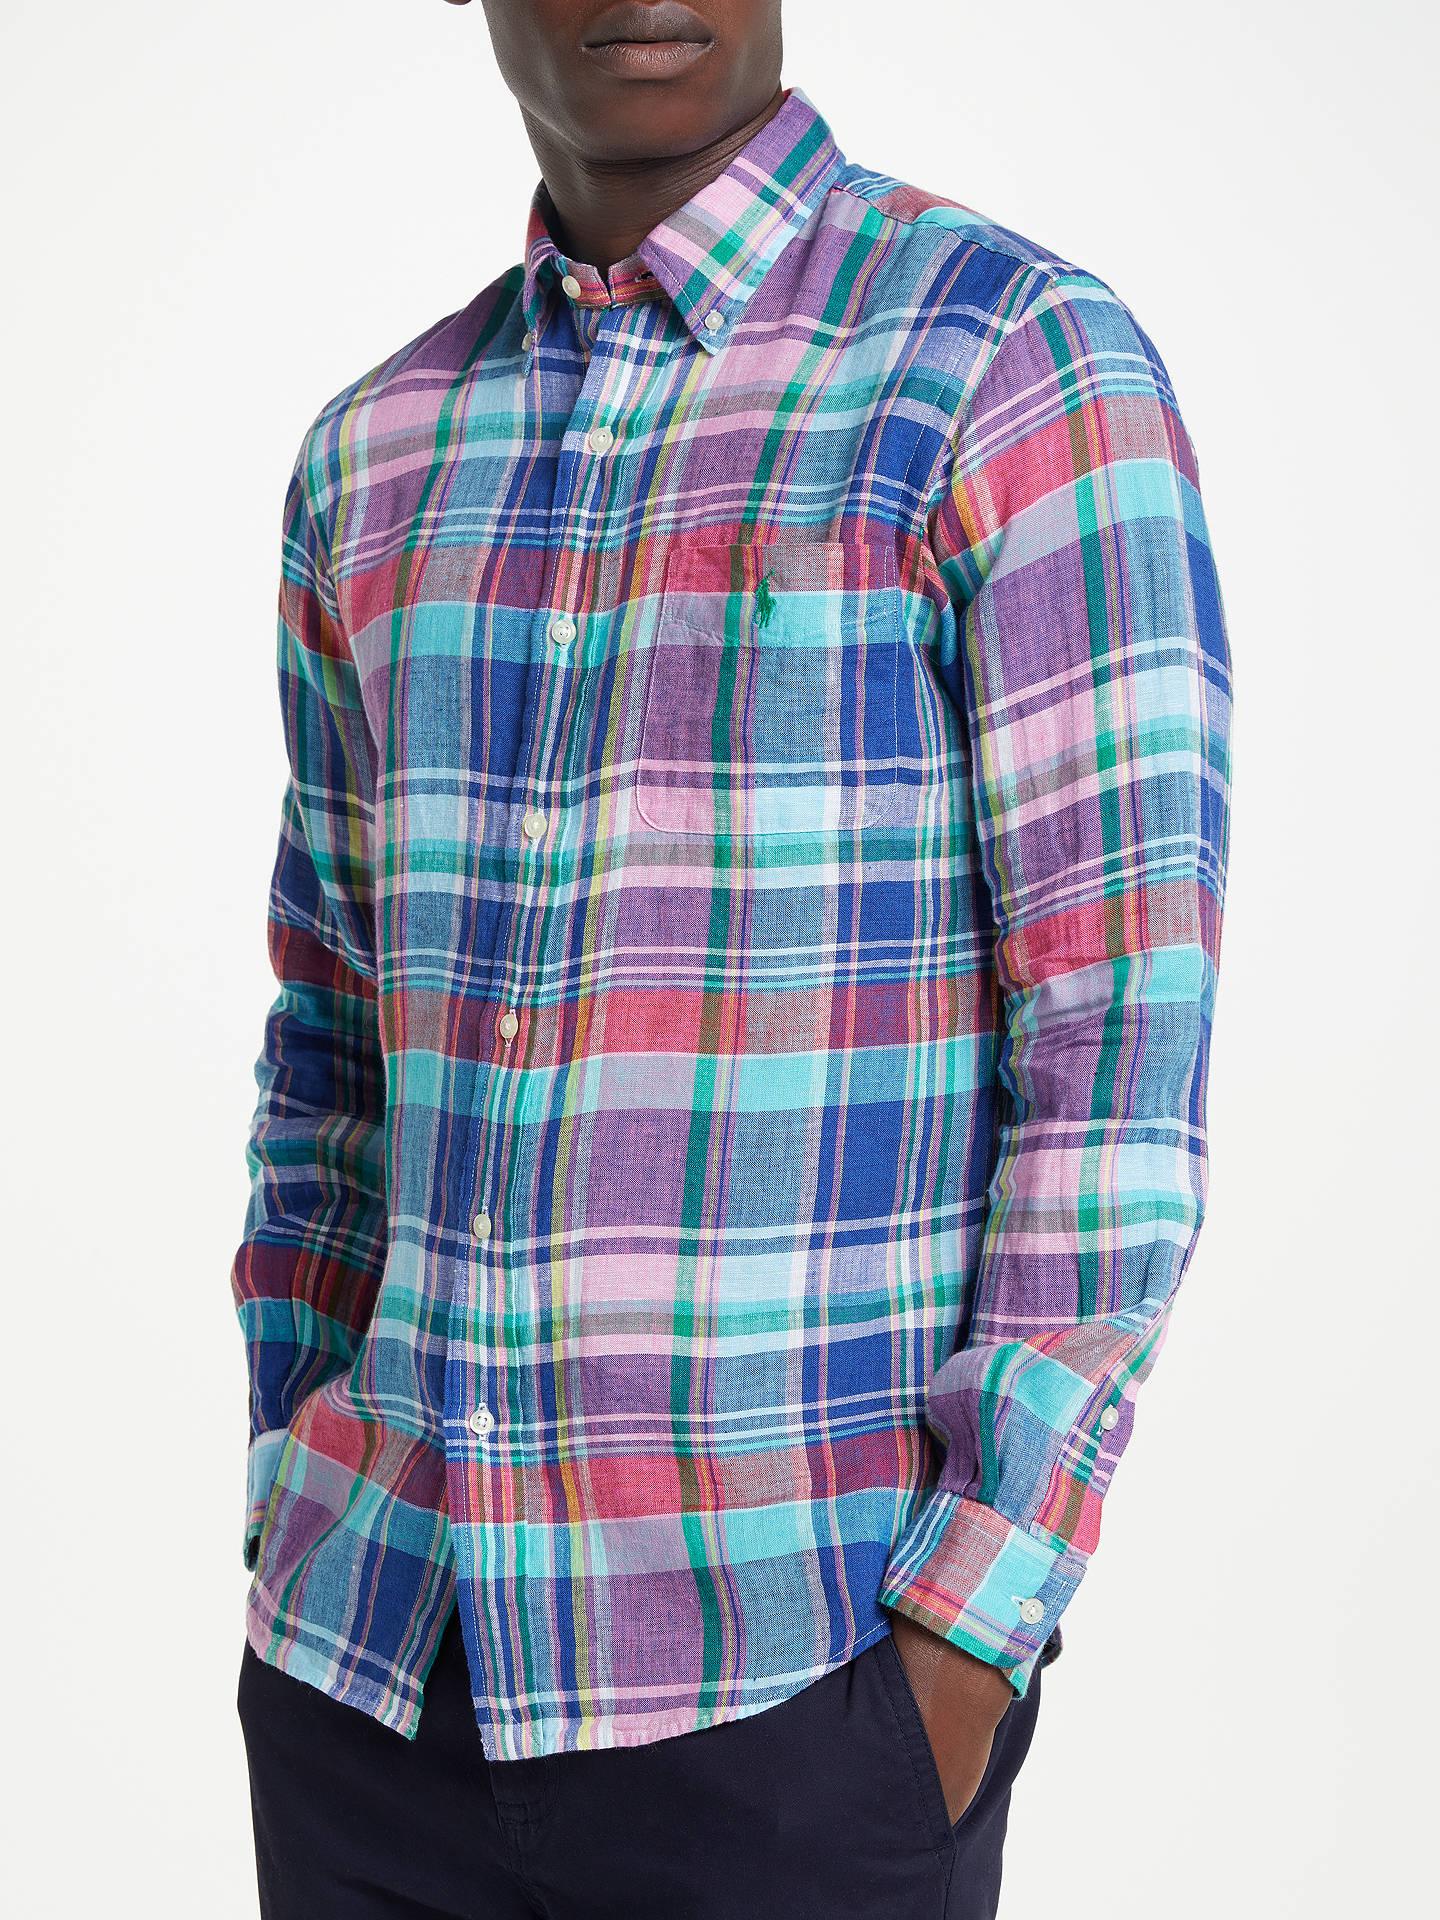 74c1fe571 Buy Polo Ralph Lauren Linen Check Shirt, Aegean Blue/Red Multi, S Online ...